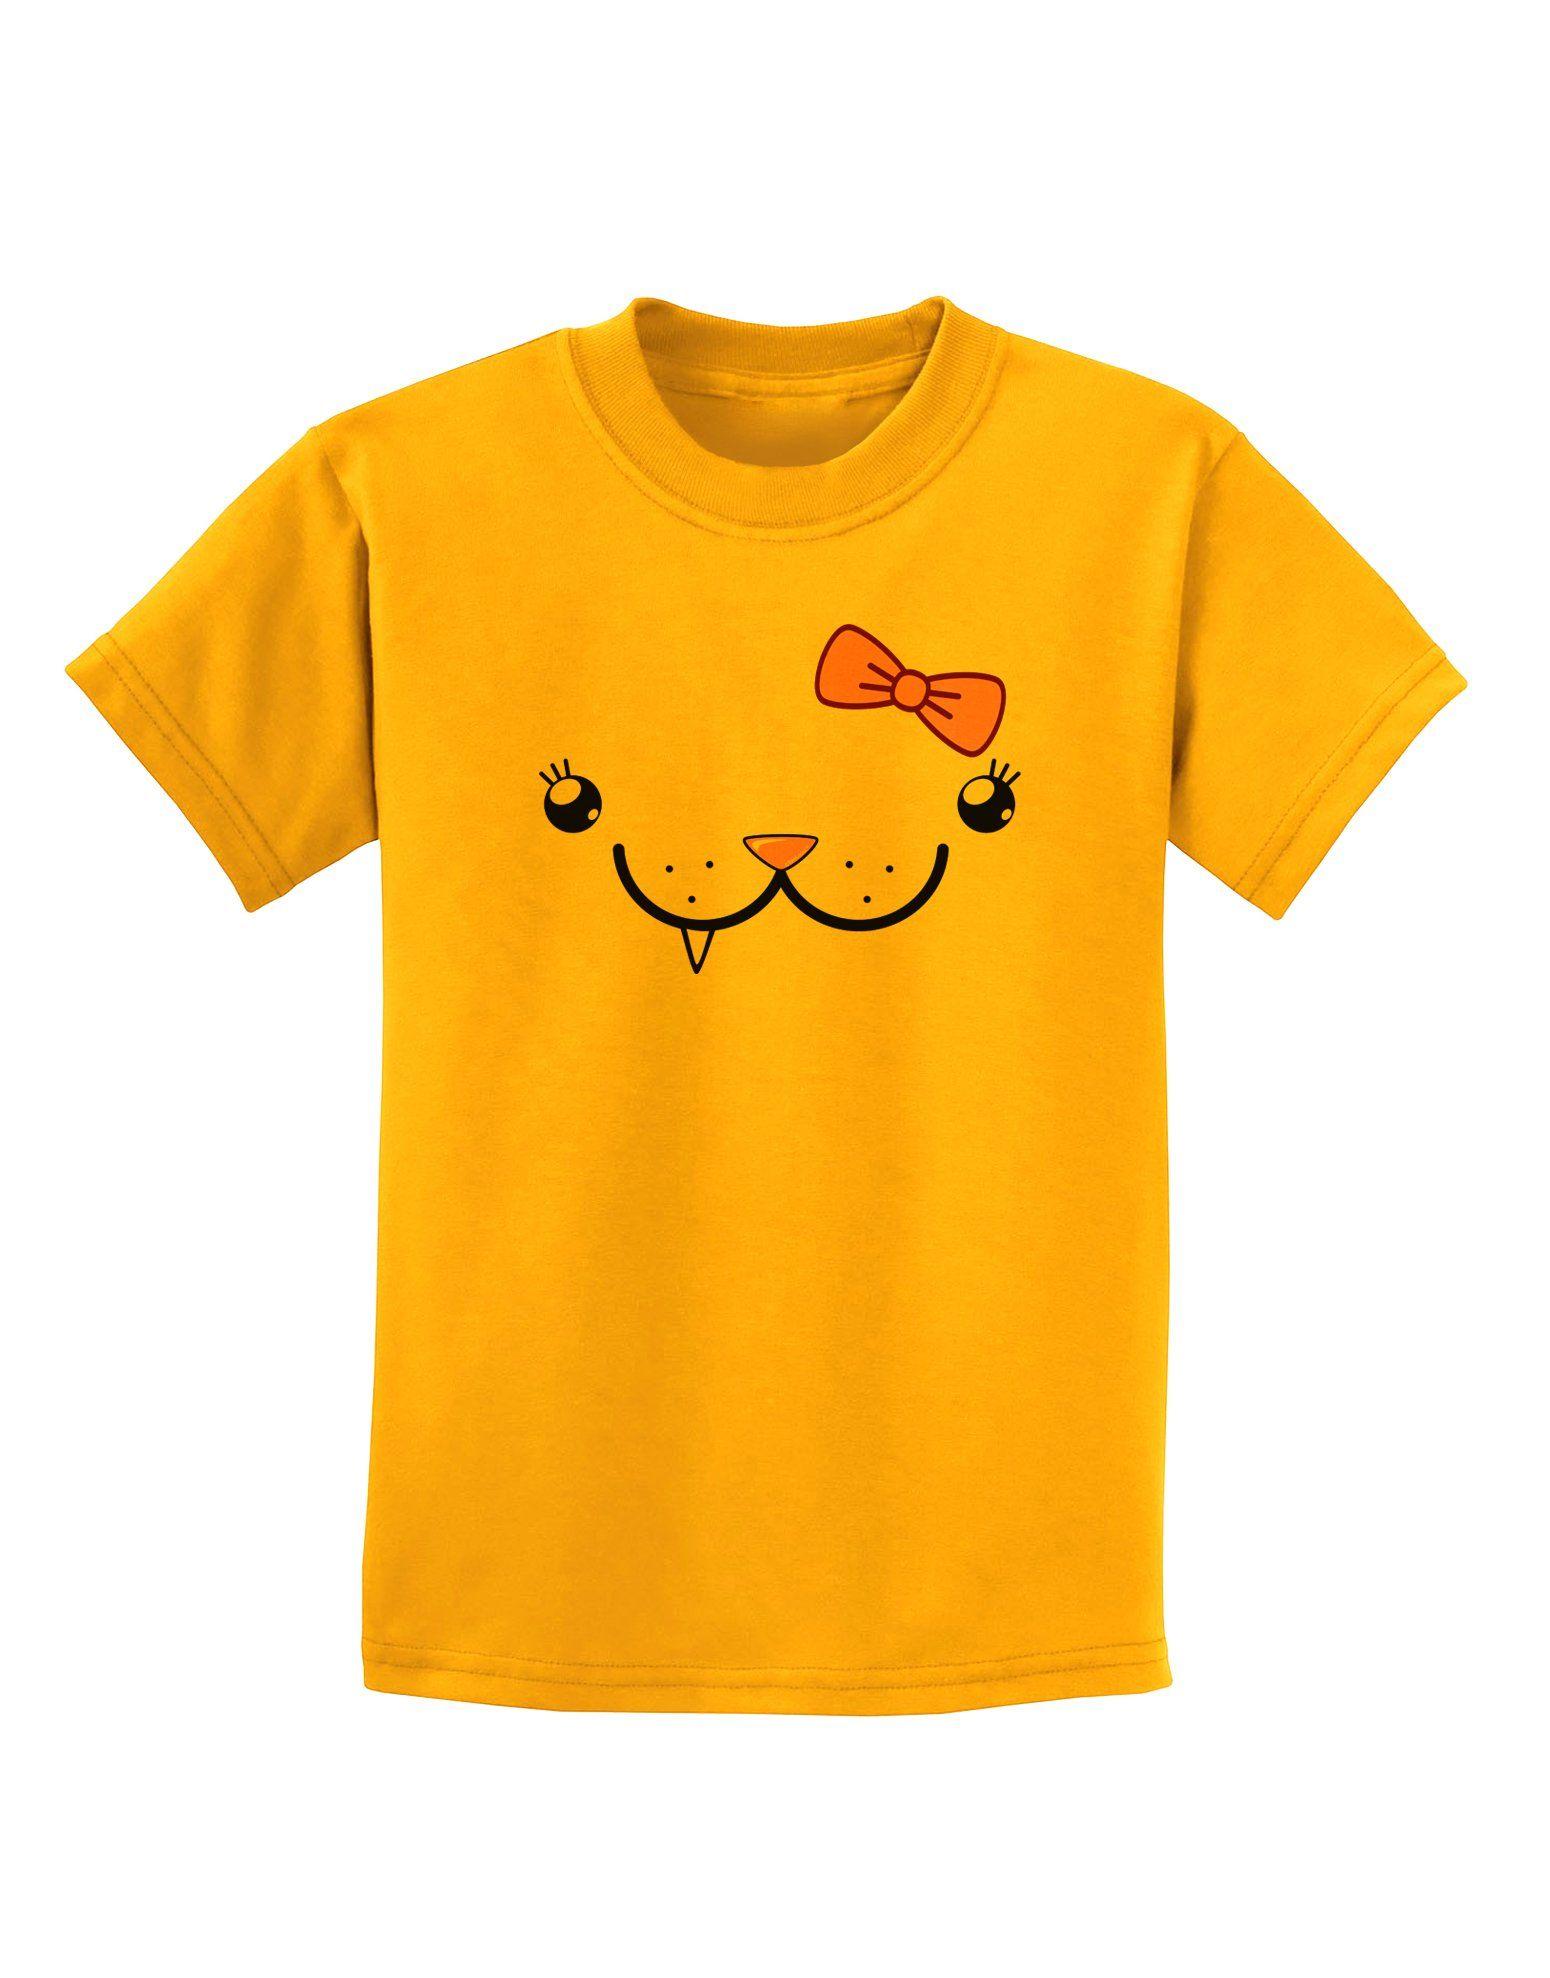 Kyu-T Face - Snagglette Cute Girl Critter Childrens T-Shirt